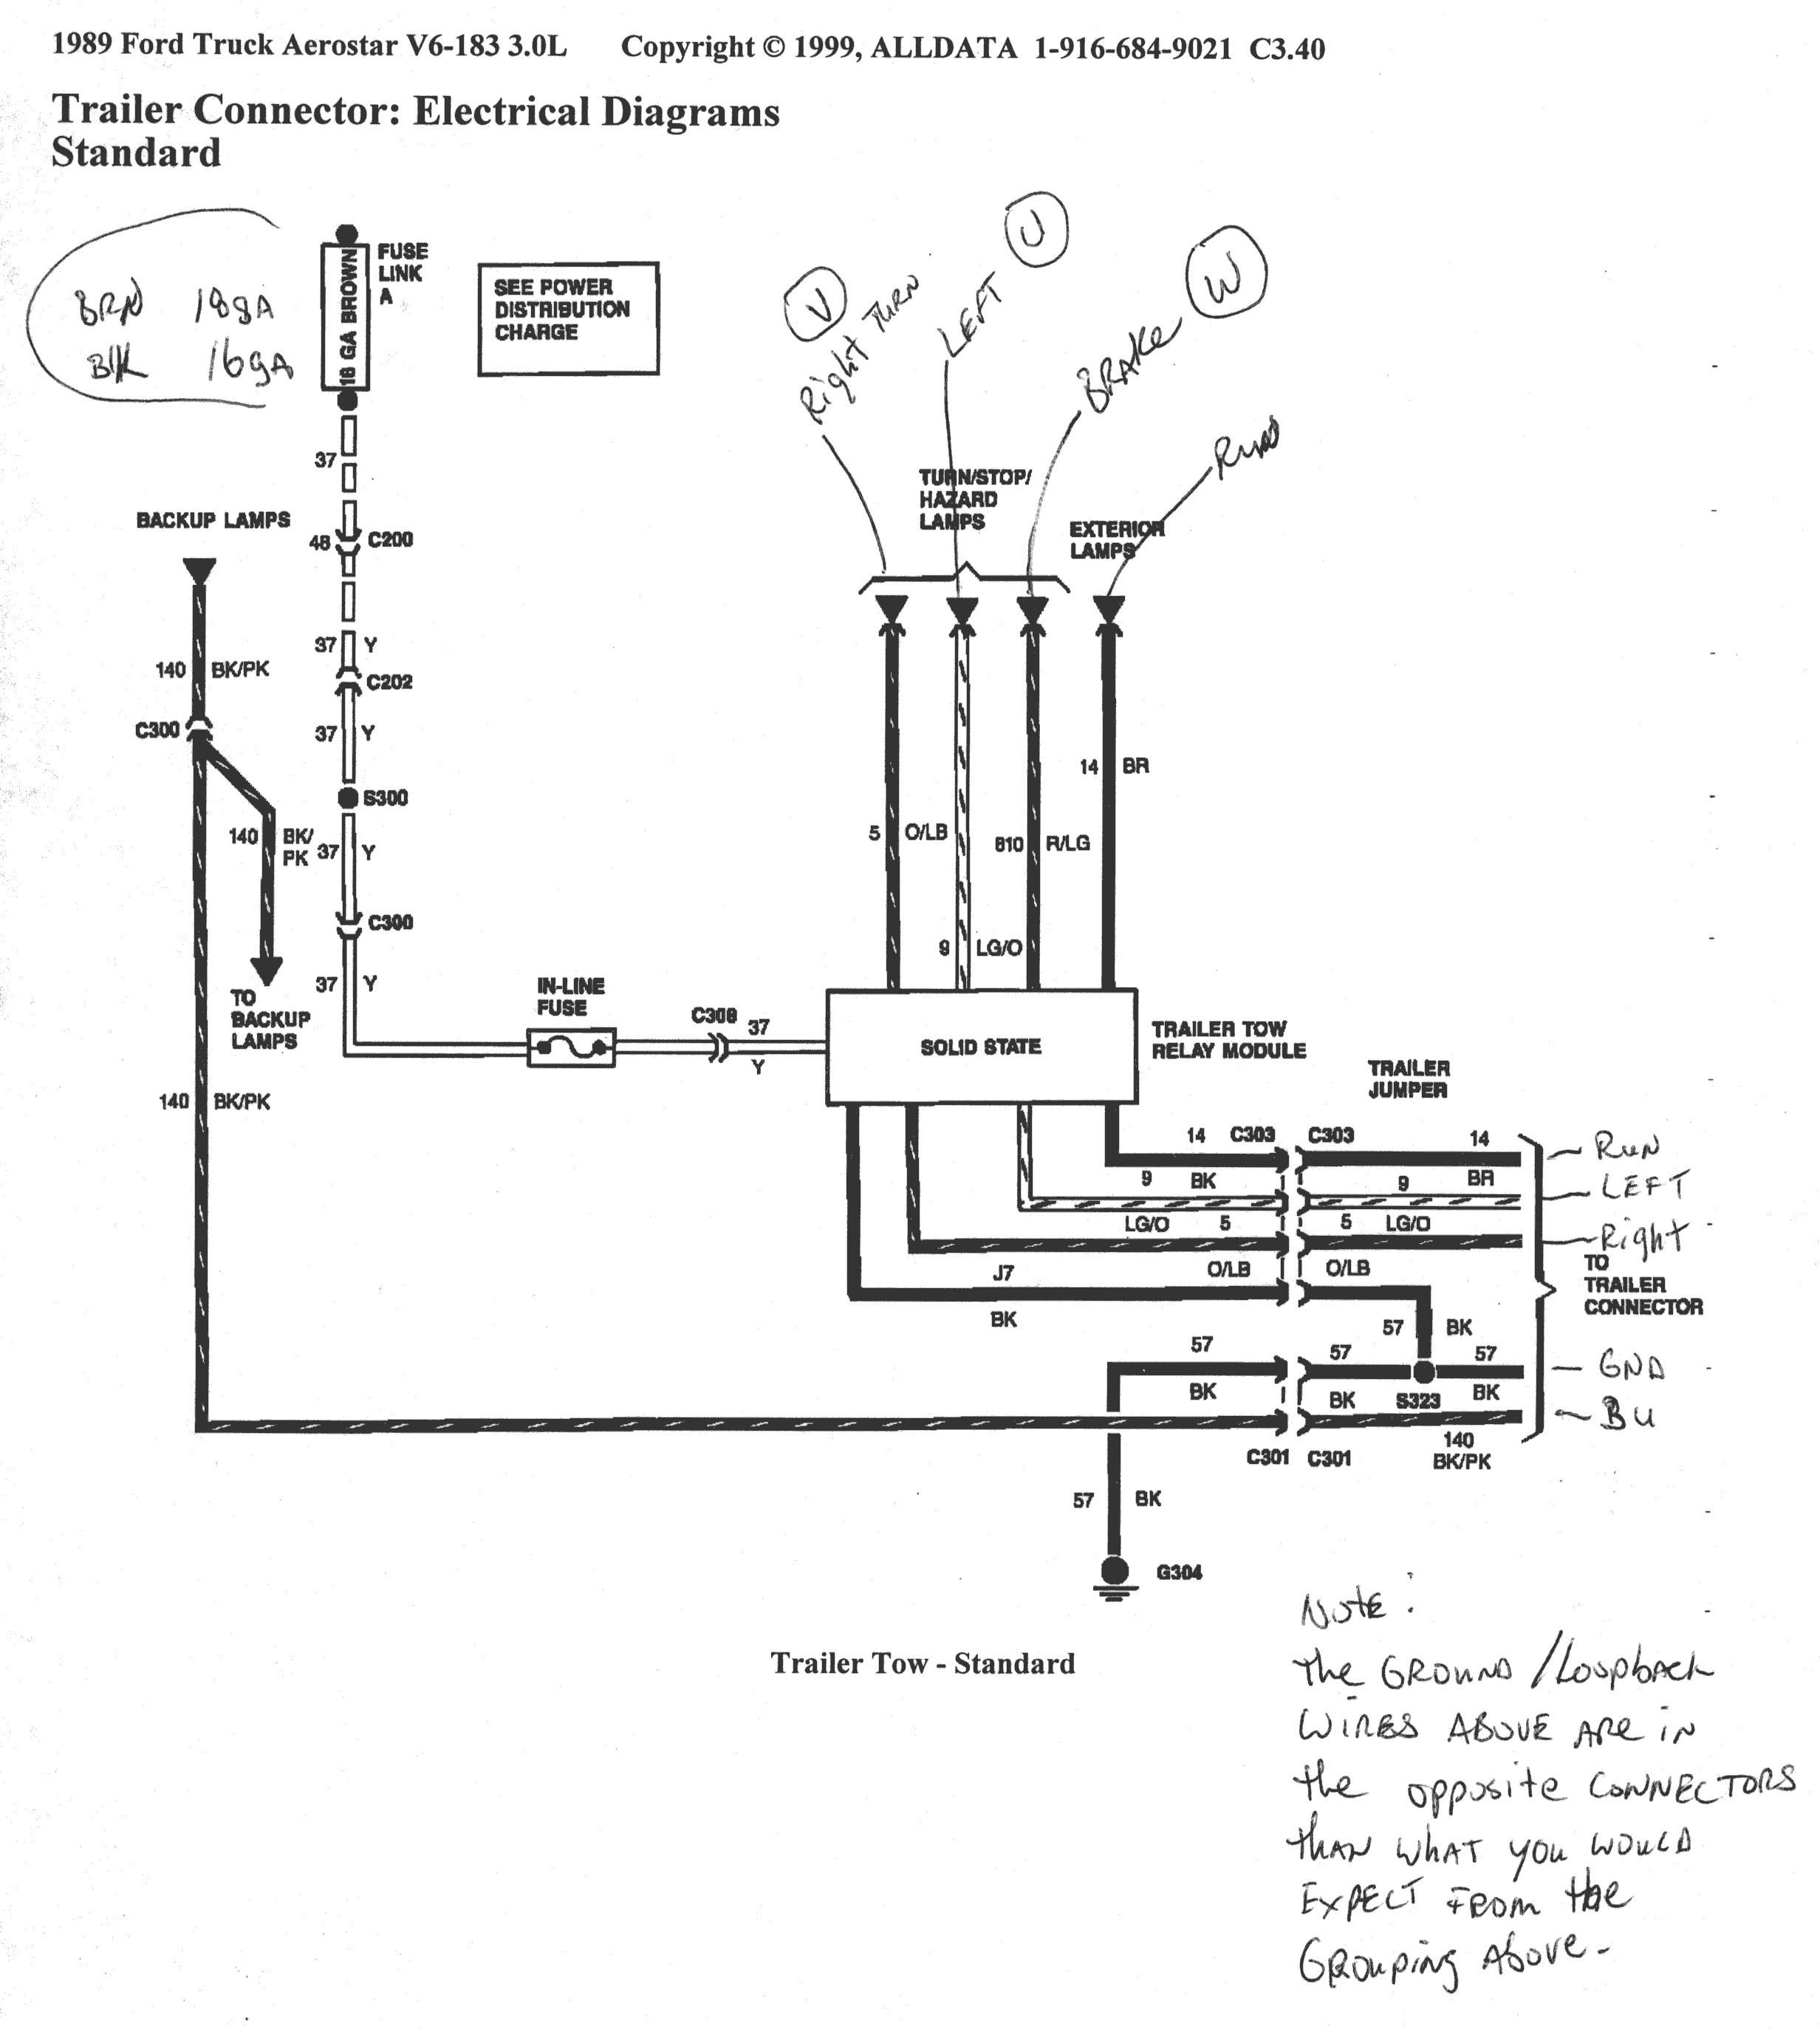 Wells Fargo Trailer Wiring Diagram - 2005 Gmc Yukon Xl Wiring Diagram |  siap-tempurs.tos-tos.romliestoss.frNew Wiring Diagram Full Edition